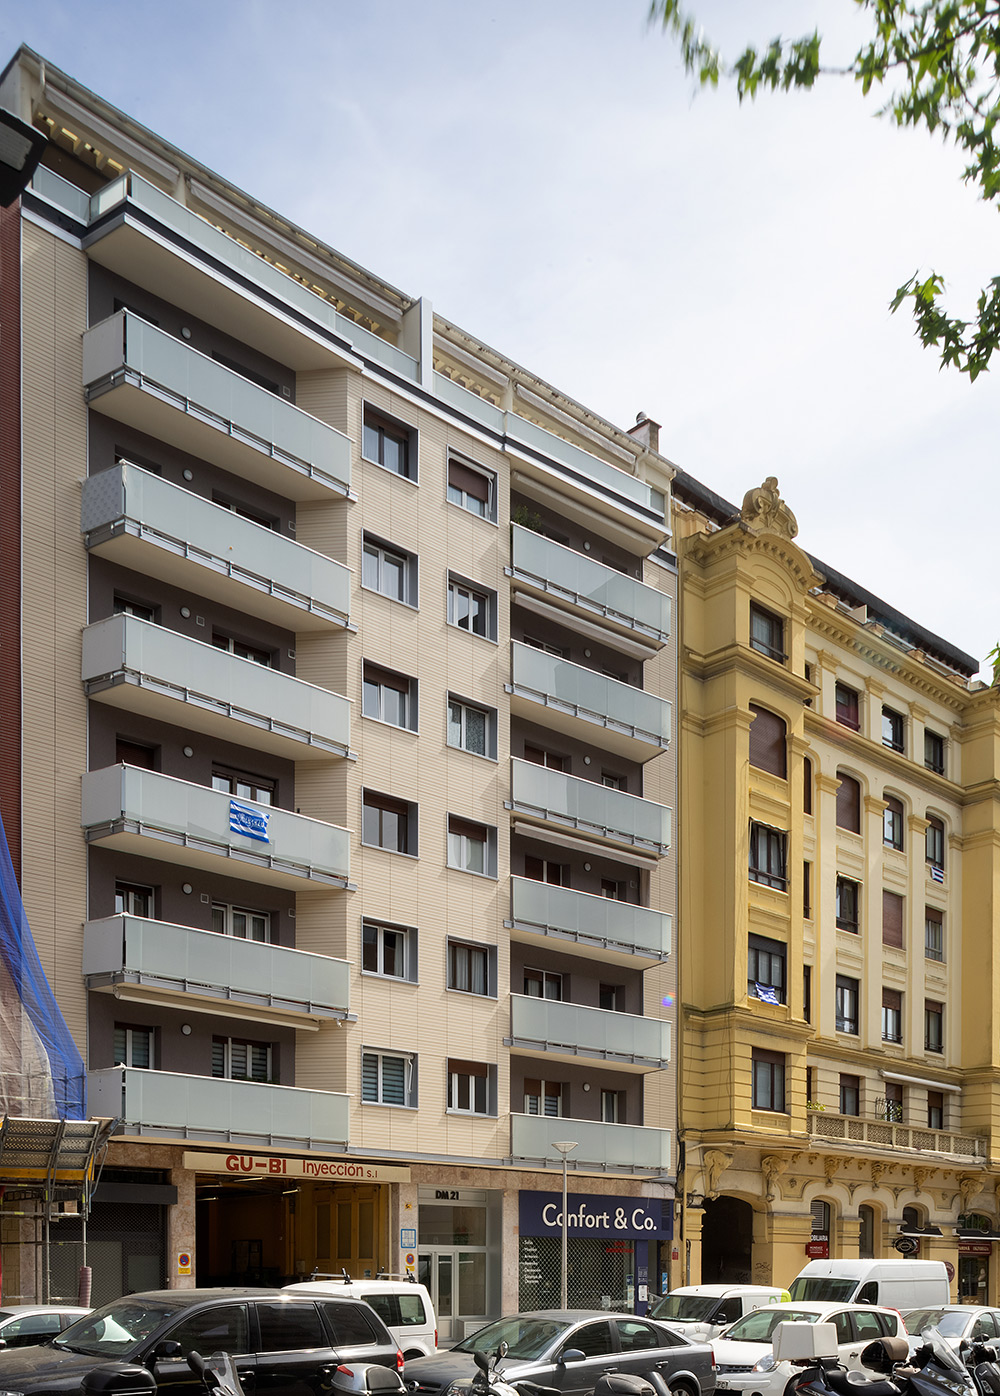 Rehabilitacion-energetica-fachada_ventilada-ceramica_BASA-Arquitectura-San-Sebastian-Donosti_5_b